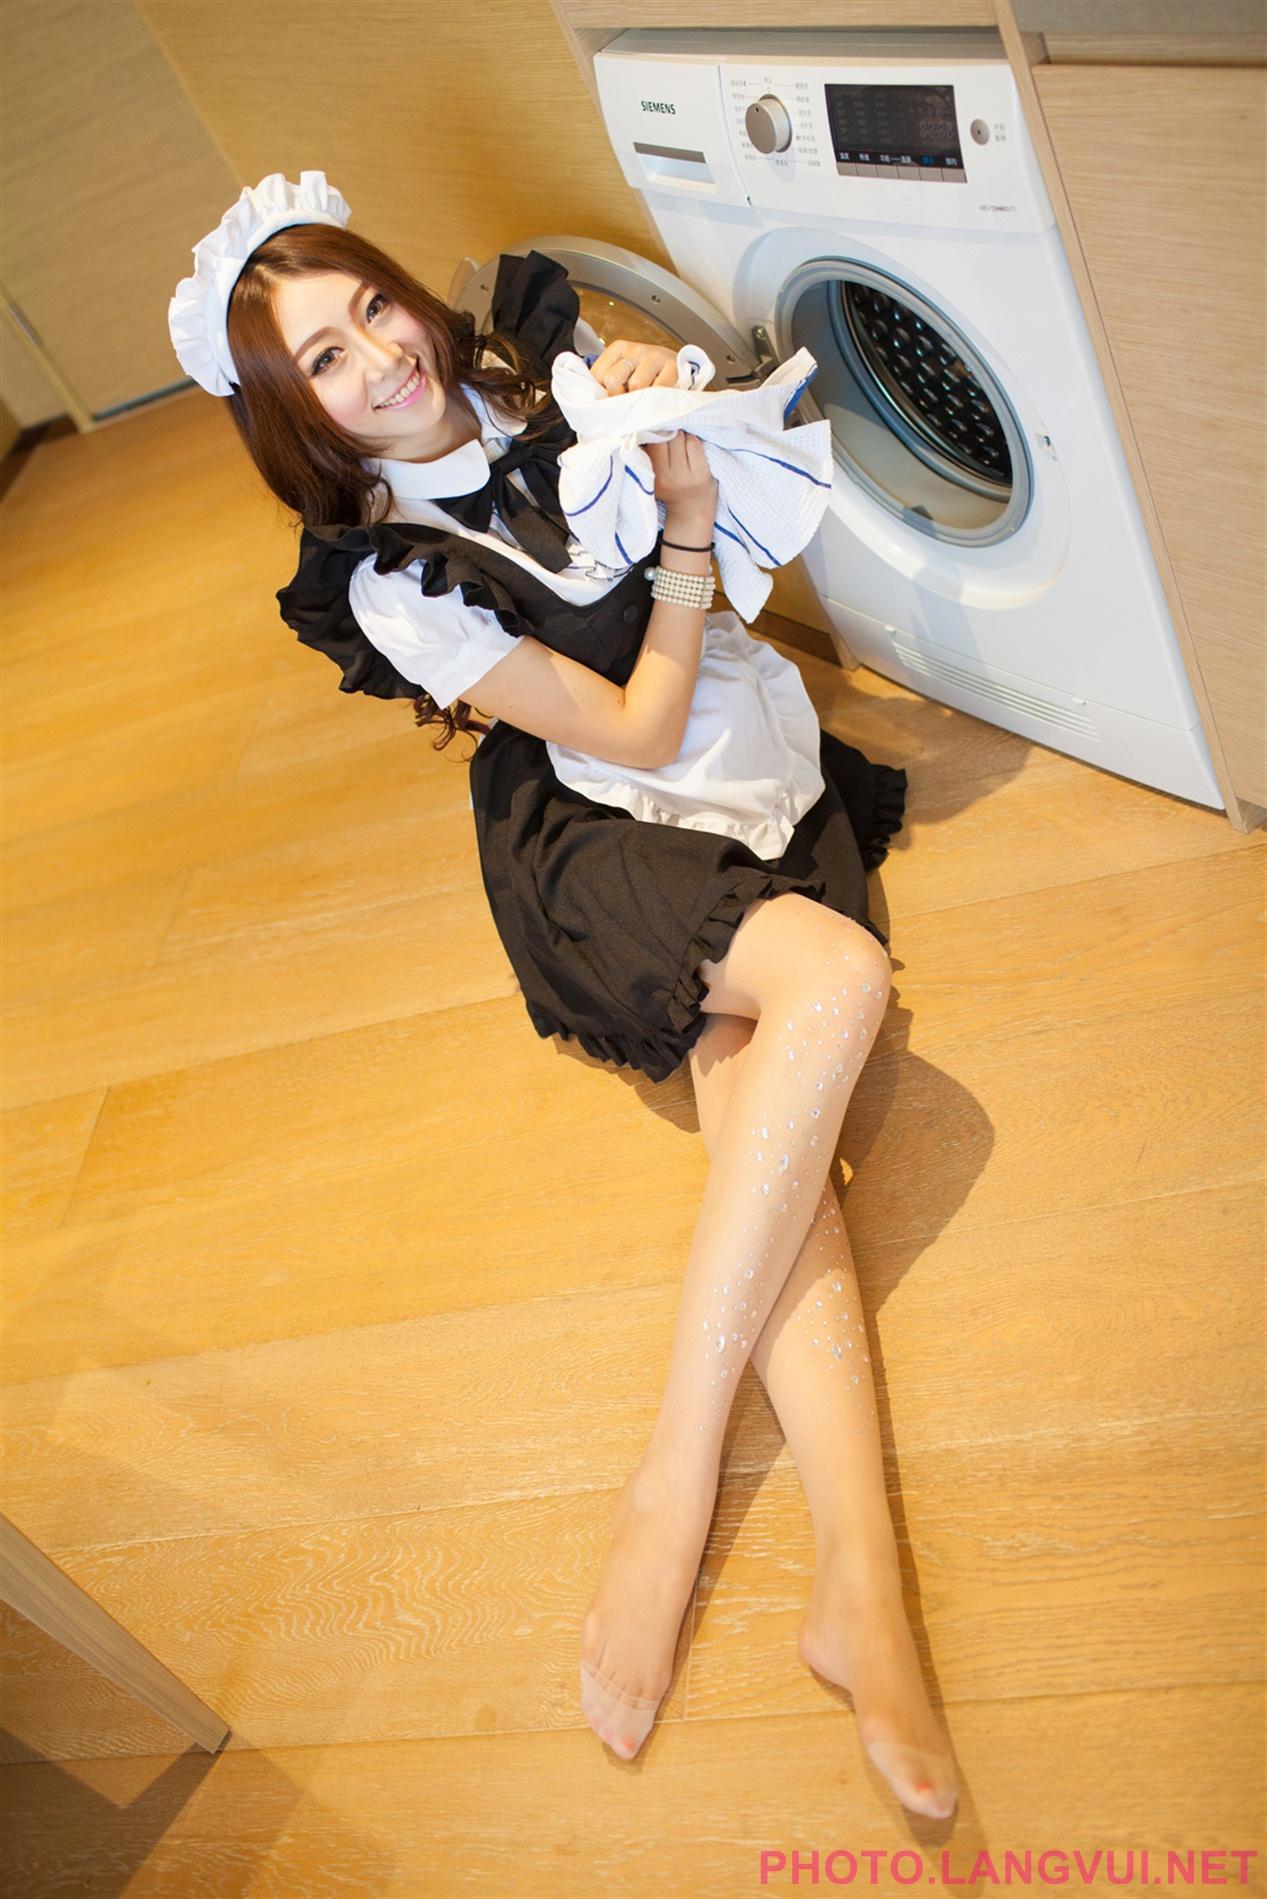 GIRLT - No.065 (41 pics) - Page 2 of 2 - Asian Beauty Image